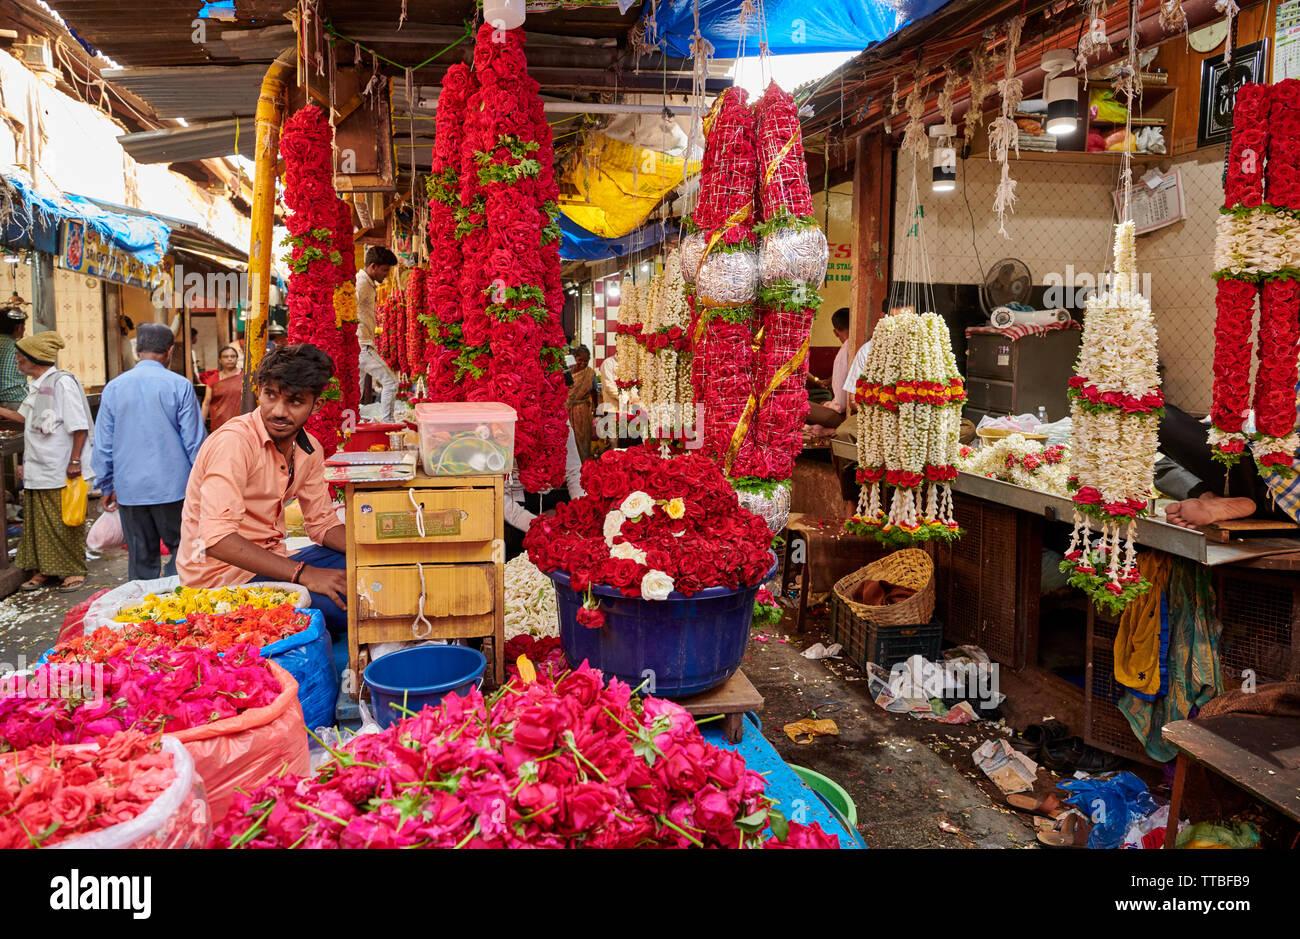 Mysore Flower Market Stock Photos & Mysore Flower Market